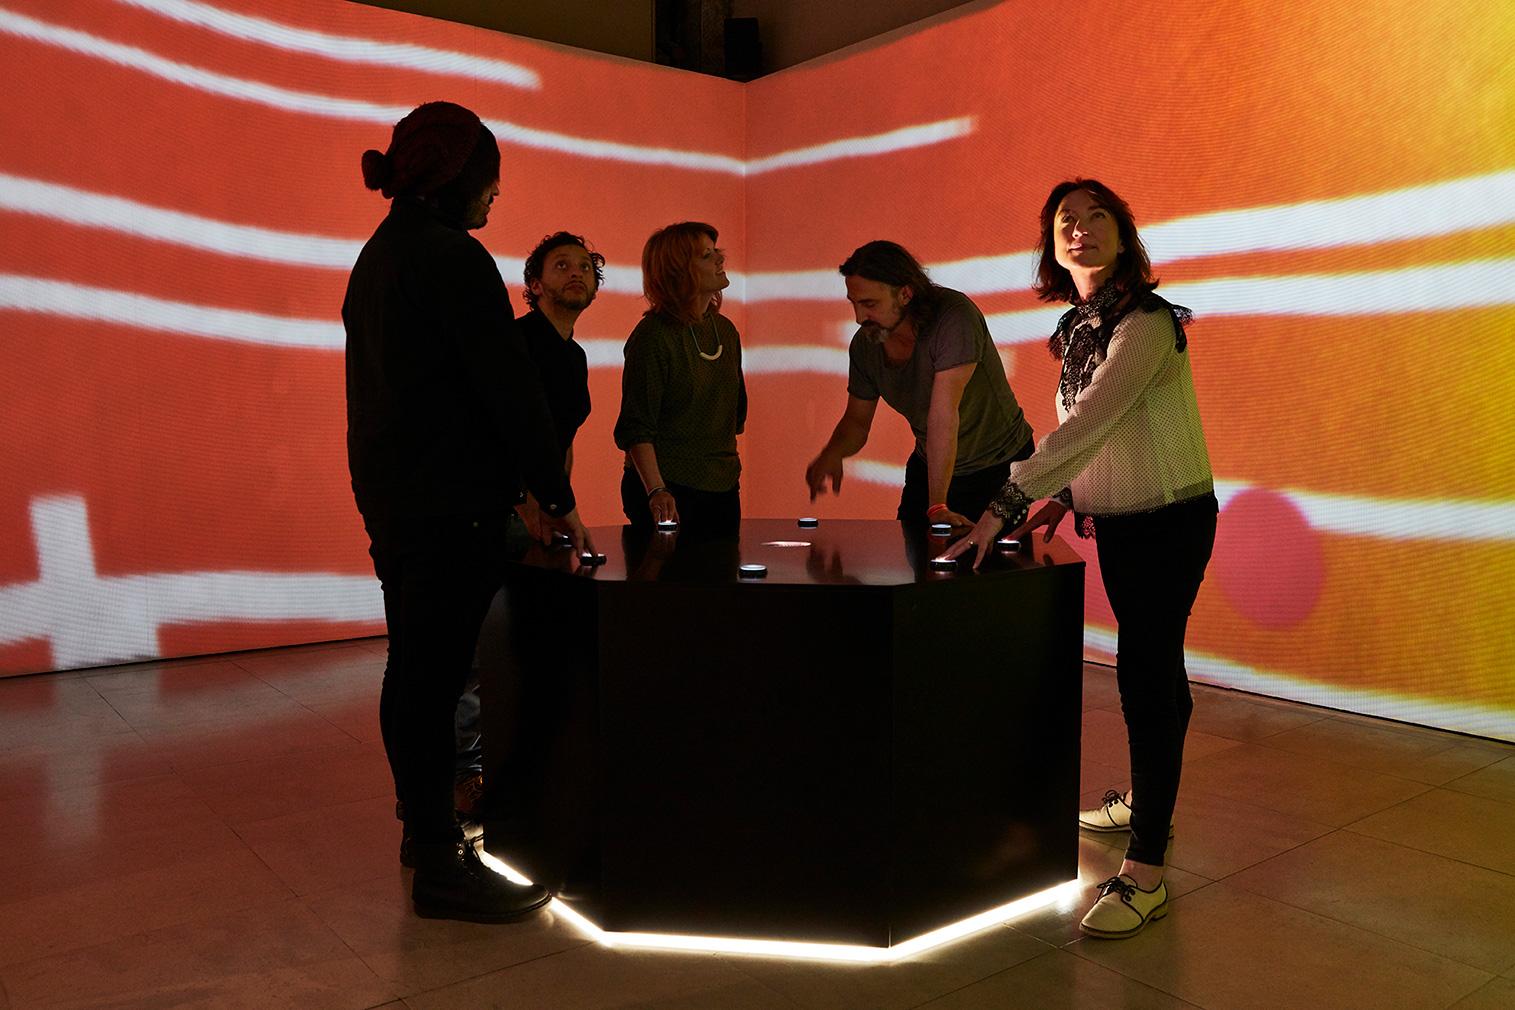 Dundee pavilion at London Design Biennale 2018